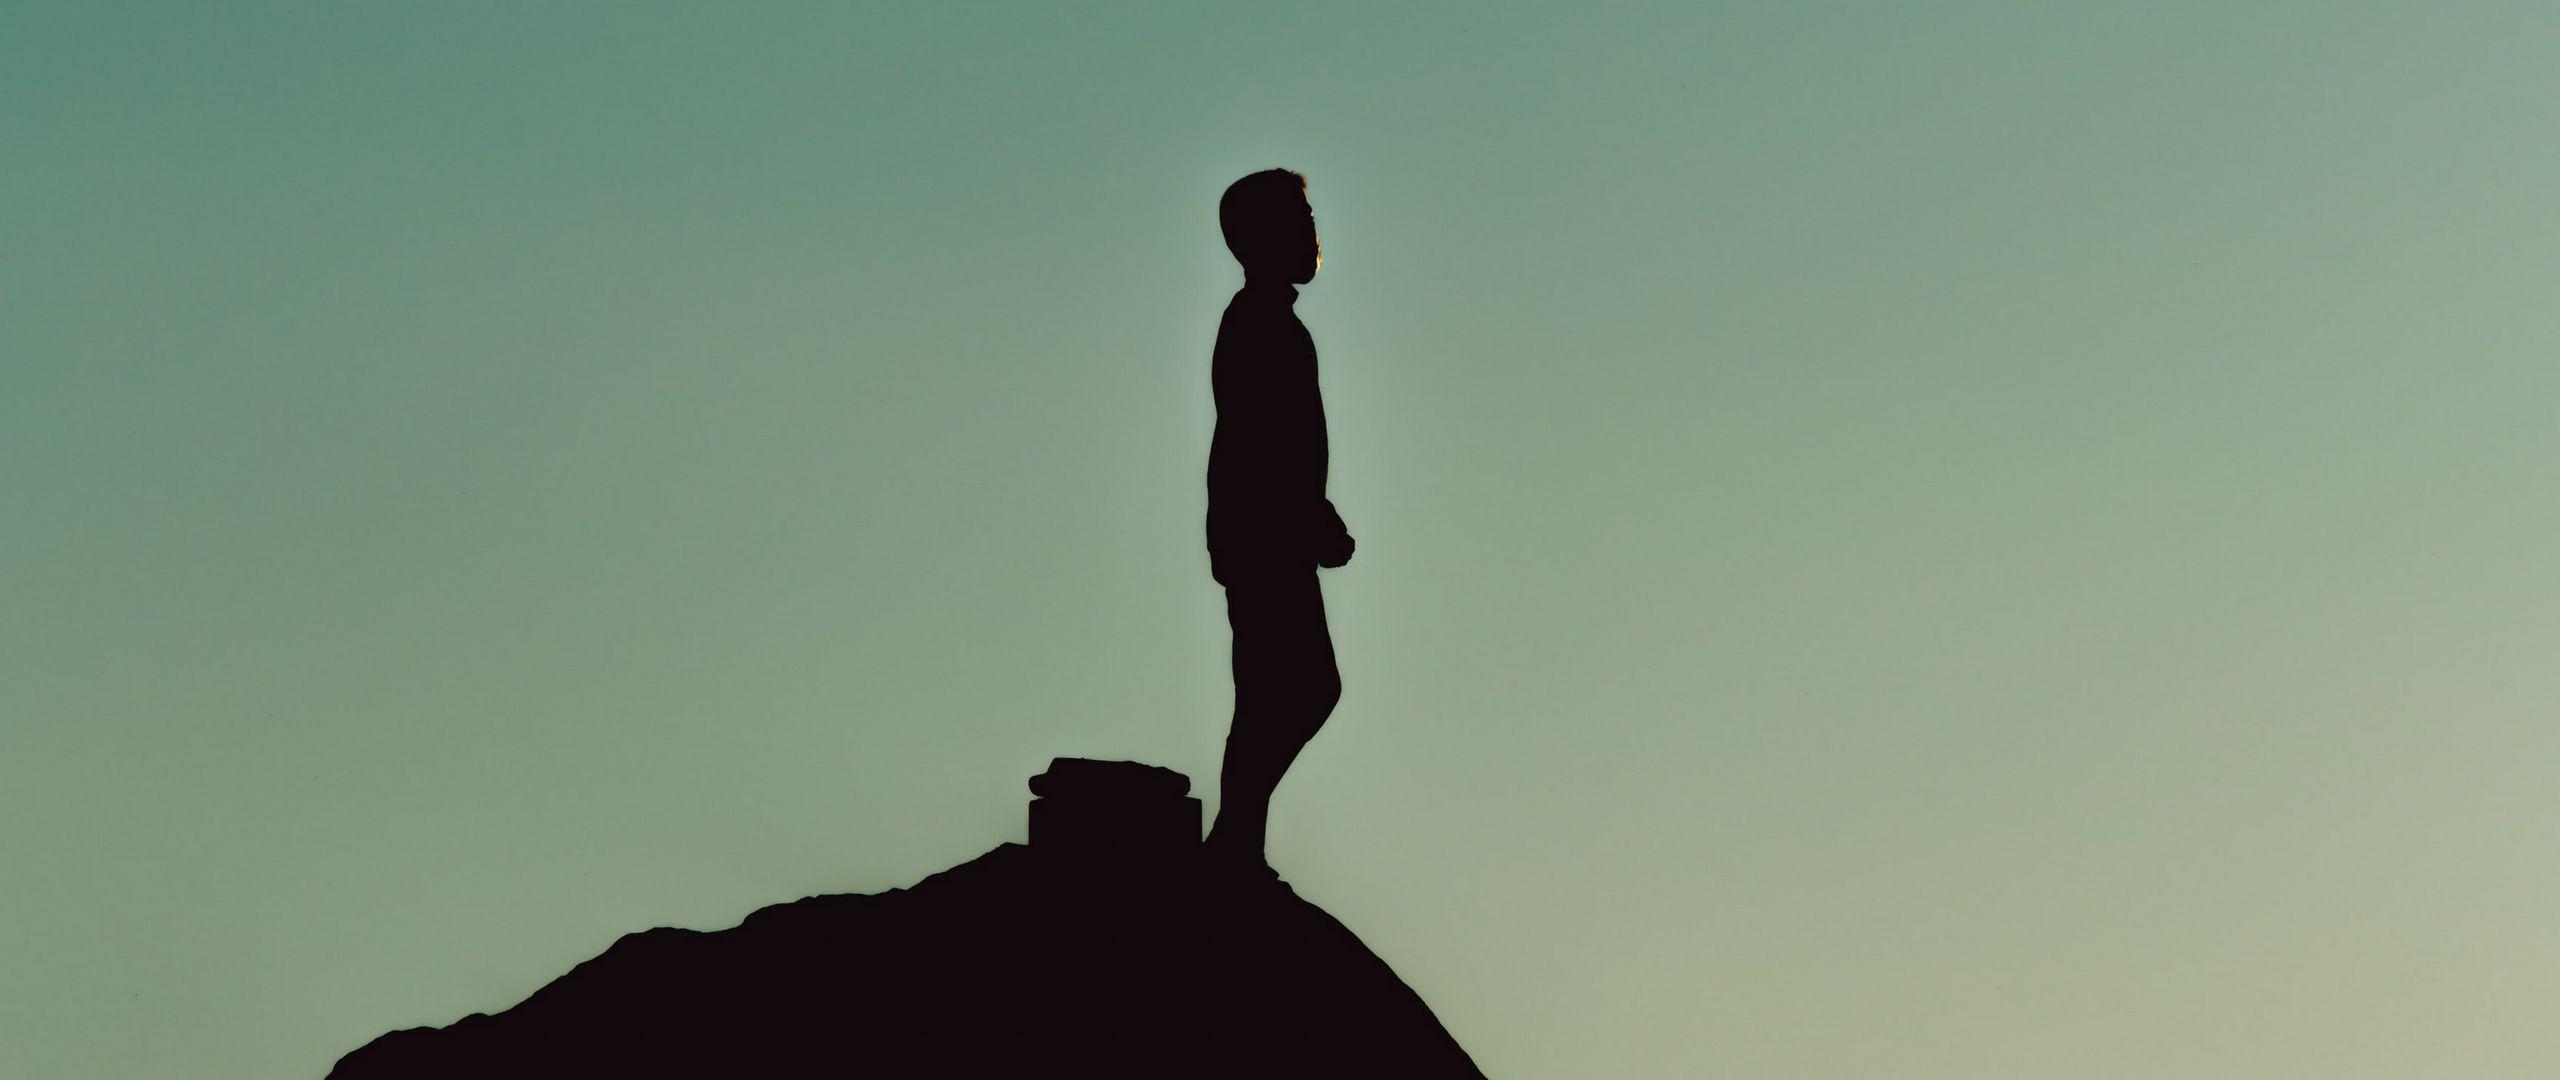 2560x1080 Wallpaper silhouette, alone, mountain, twilight, dark